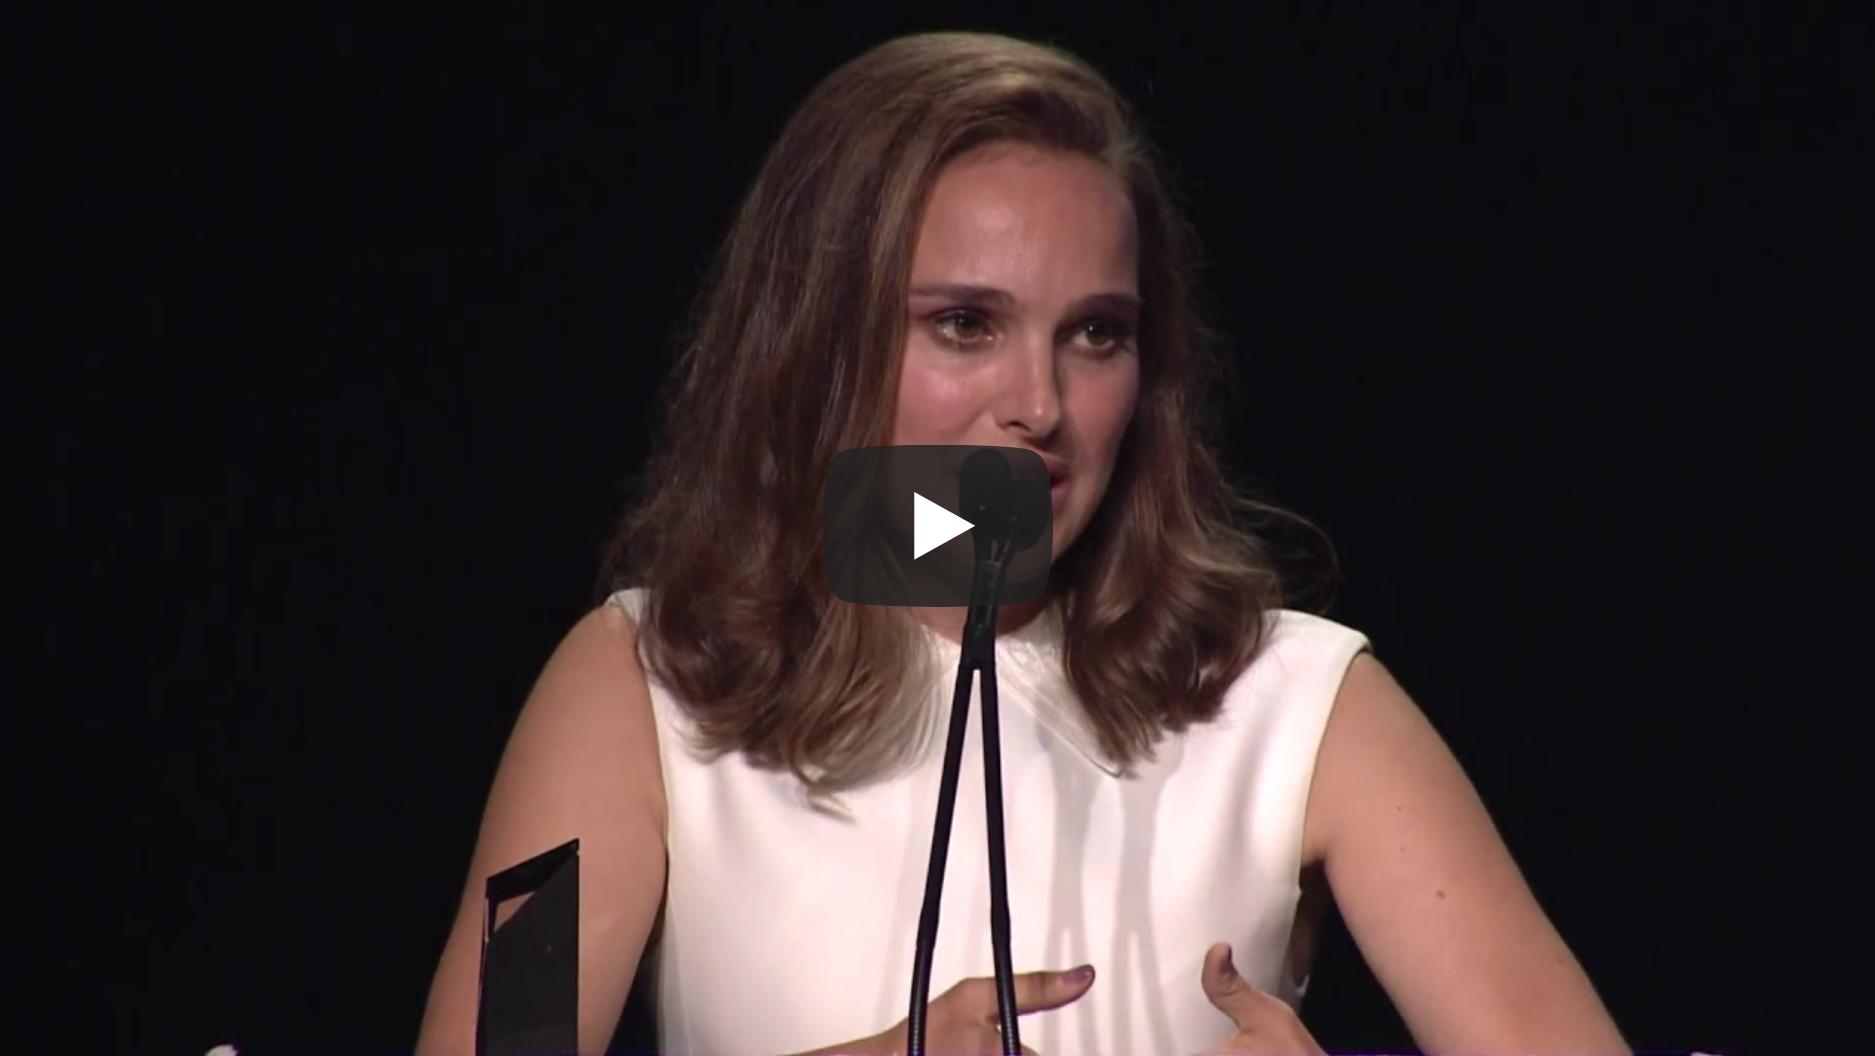 Natalie Portman's Speech at the 2017 EMA Awards | VeganFlix